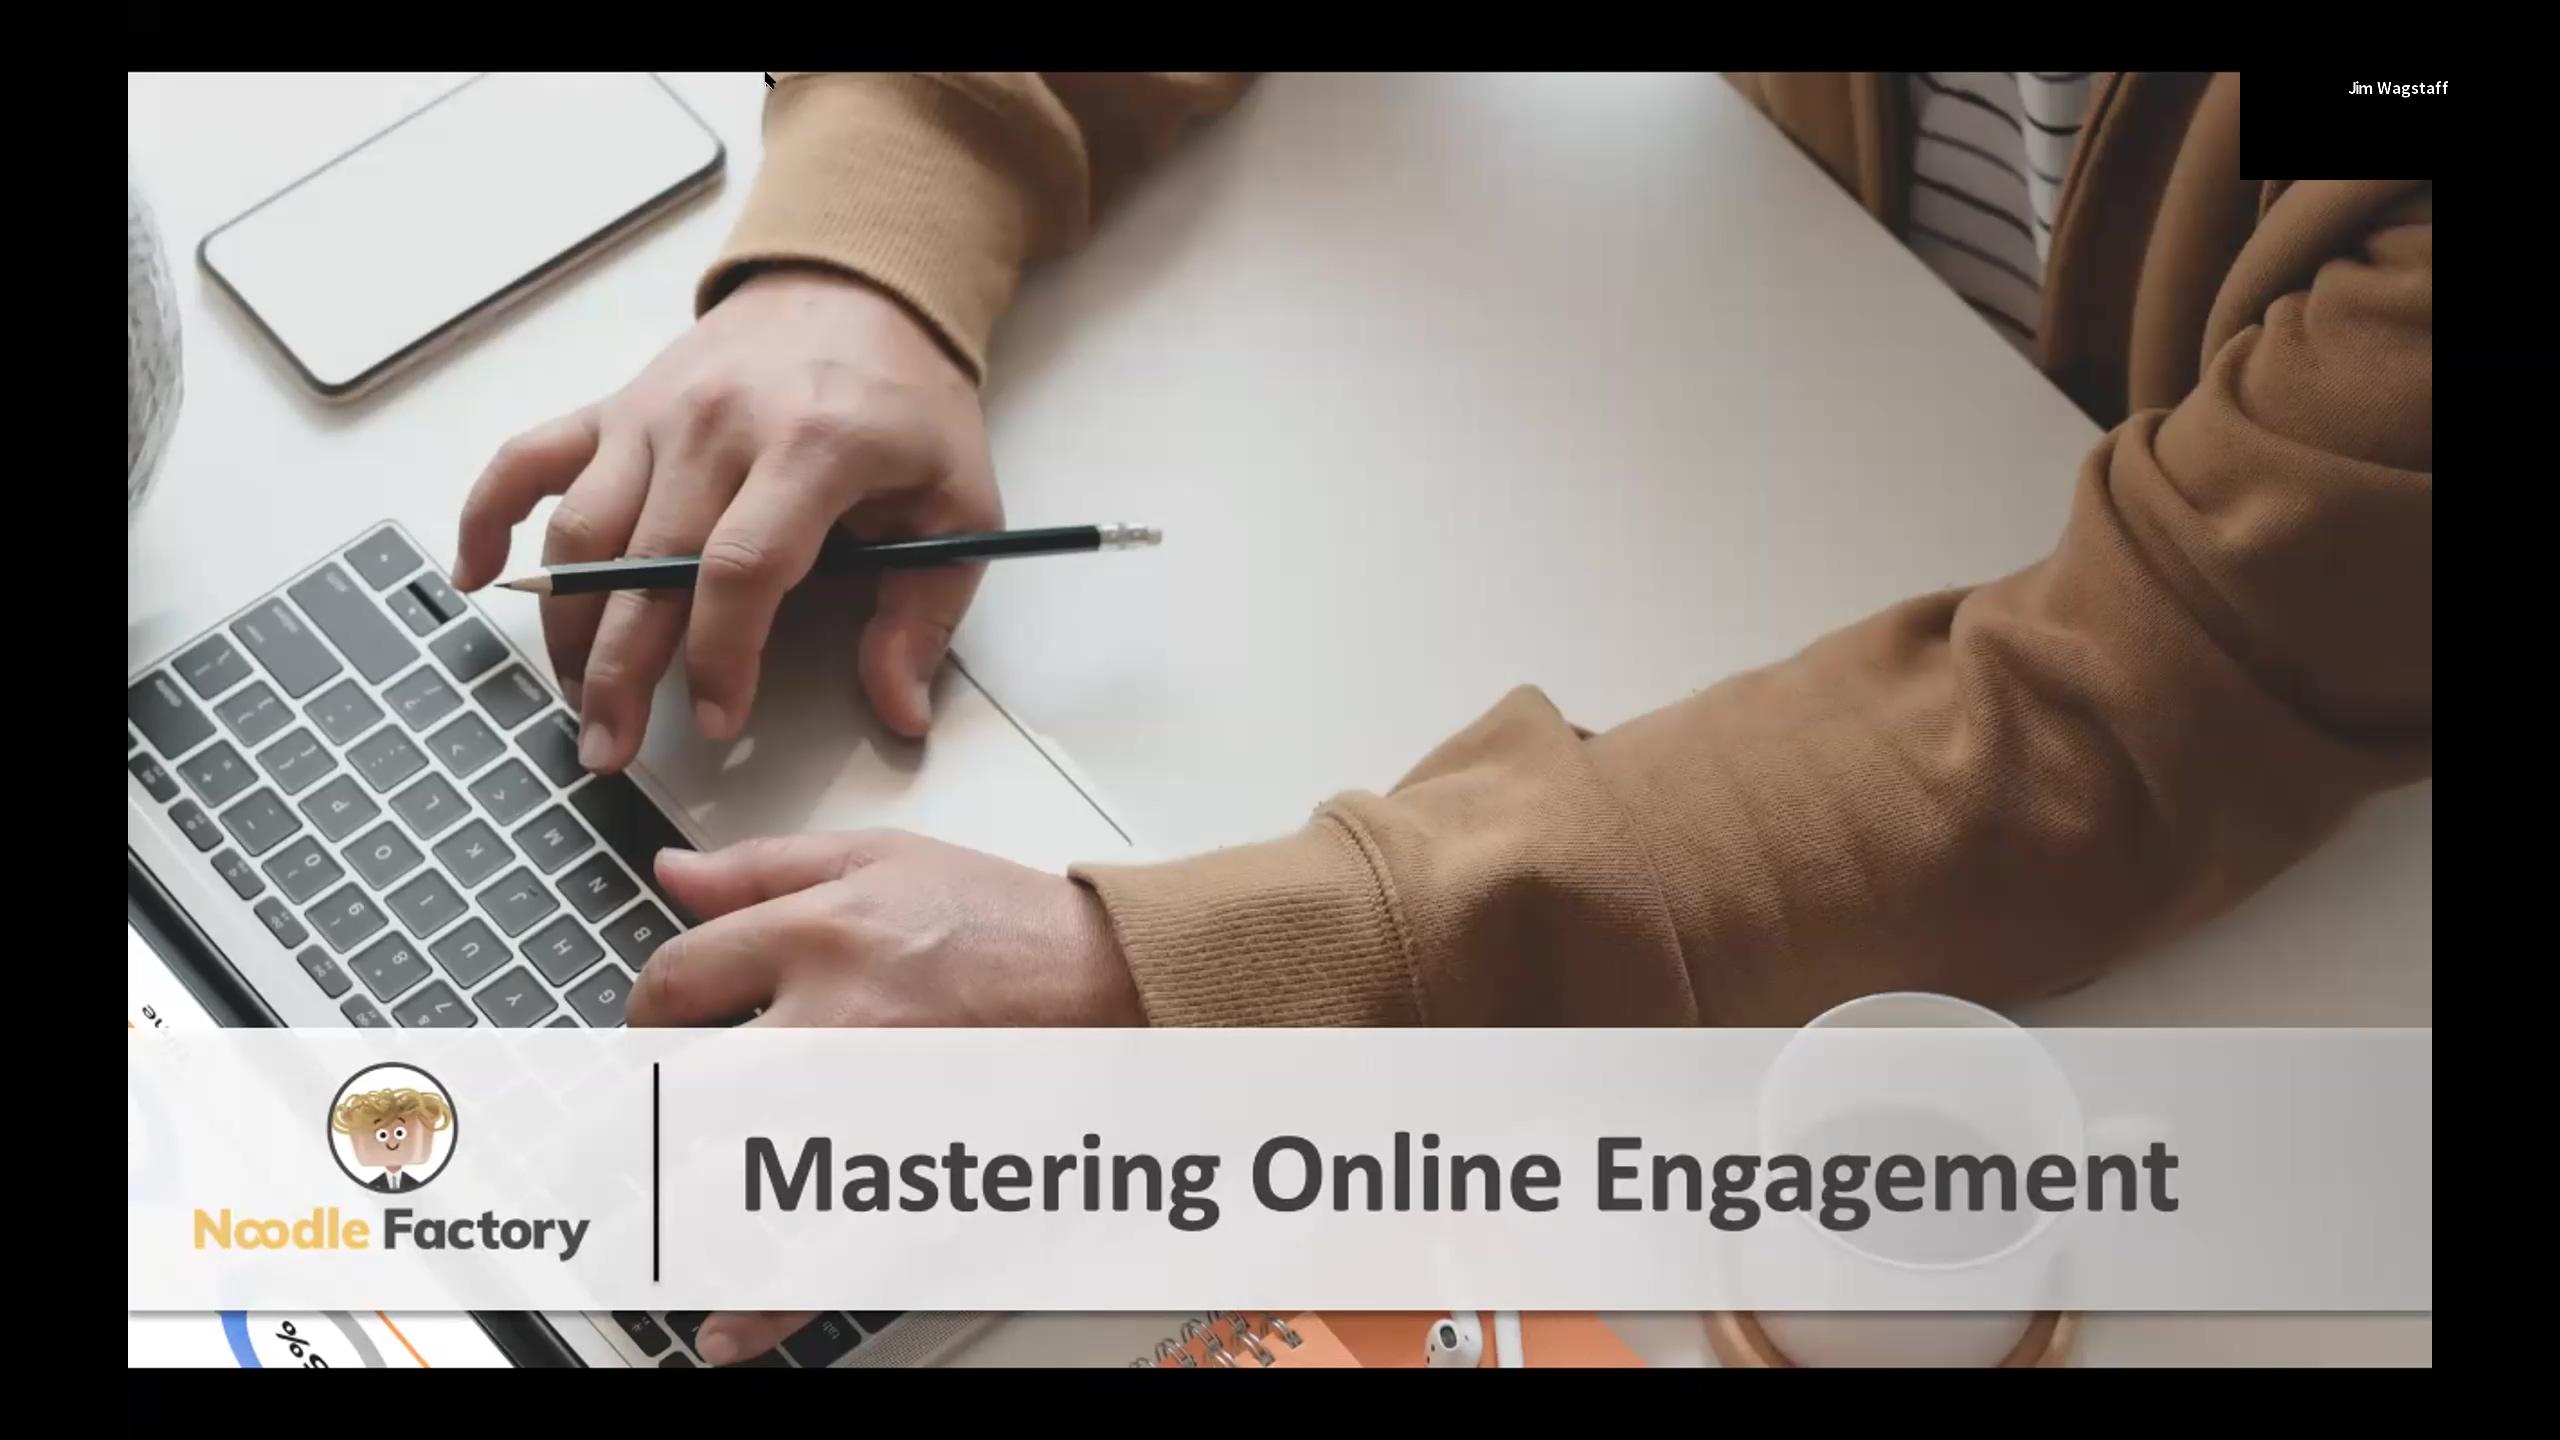 Mastering-Online-Engagement-rec-thumb